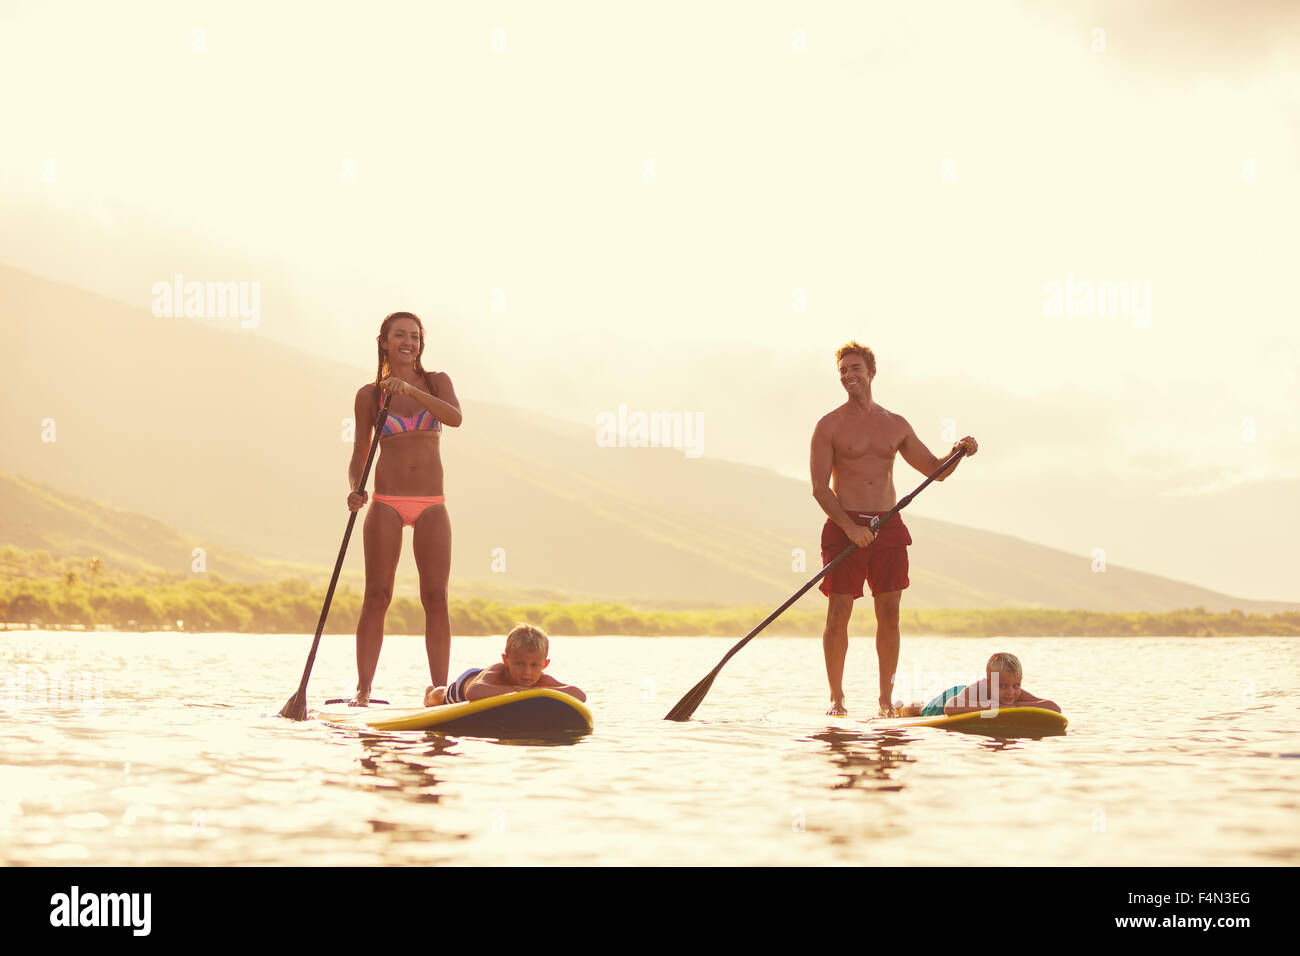 Familie Stand-up Paddeln bei Sonnenaufgang, Sommer Spaß outdoor-Lifestyle Stockbild